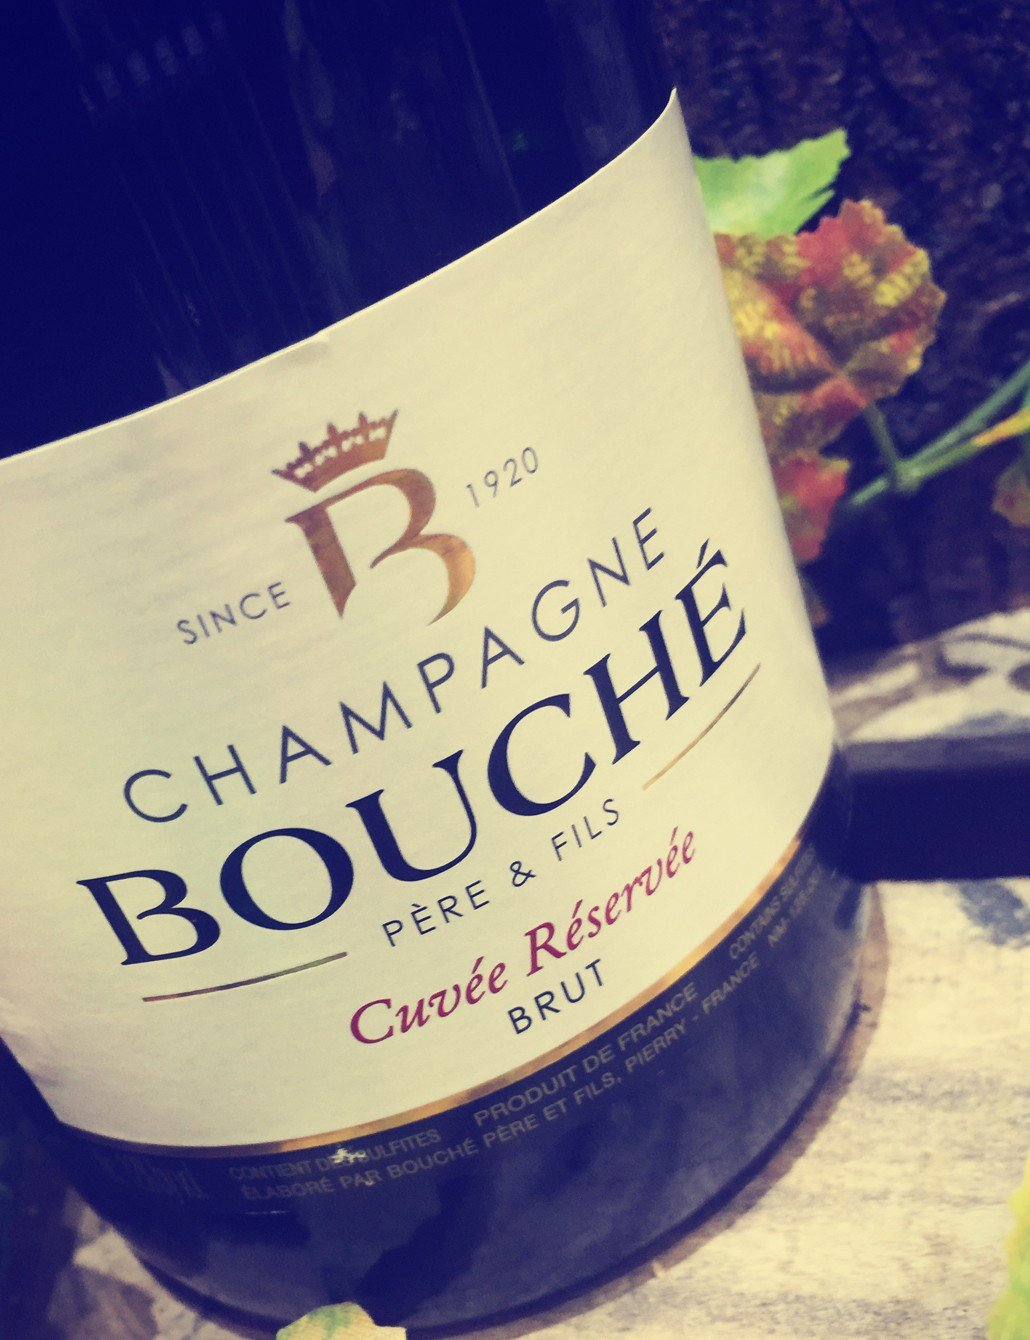 Bouch-Pre-Fils-Champagner-mit-Geschenkverpackung-Cuve-Rserve-Brut-1-x-075-l-Exklusiver-Champagner-Box